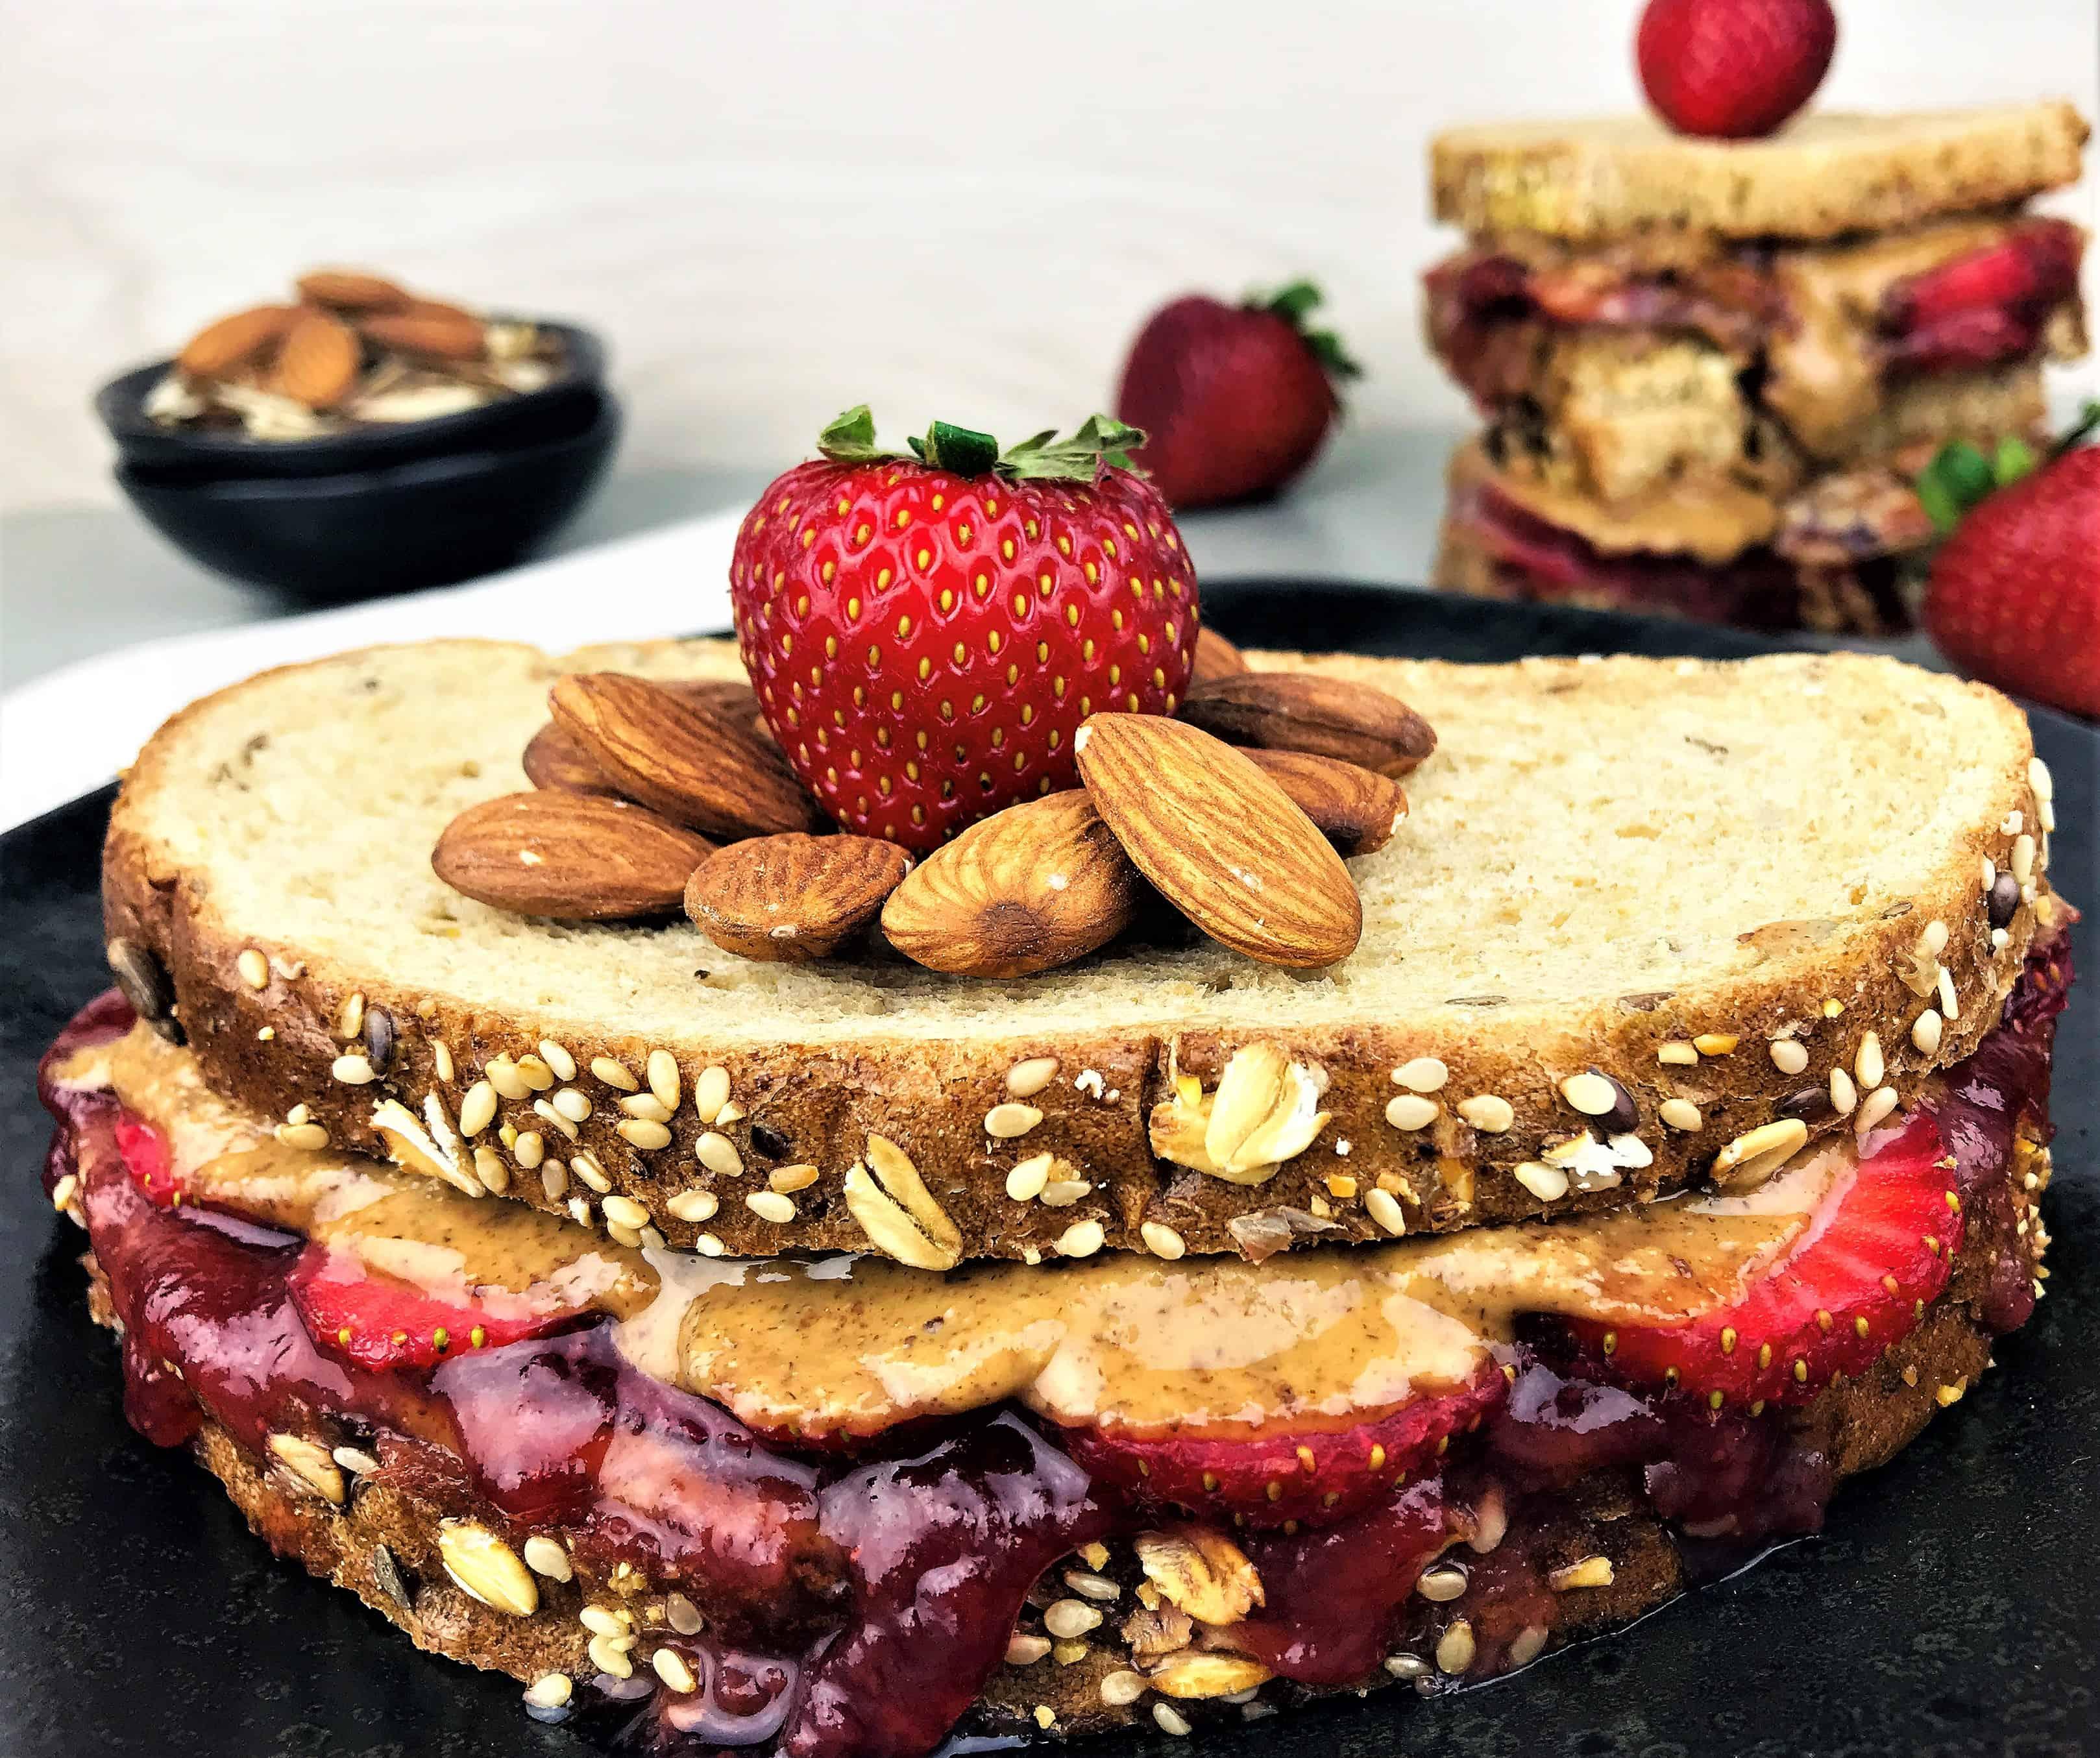 Copycat Starbucks PB&J Sandwich - Almond Butter, Strawberries and Jam